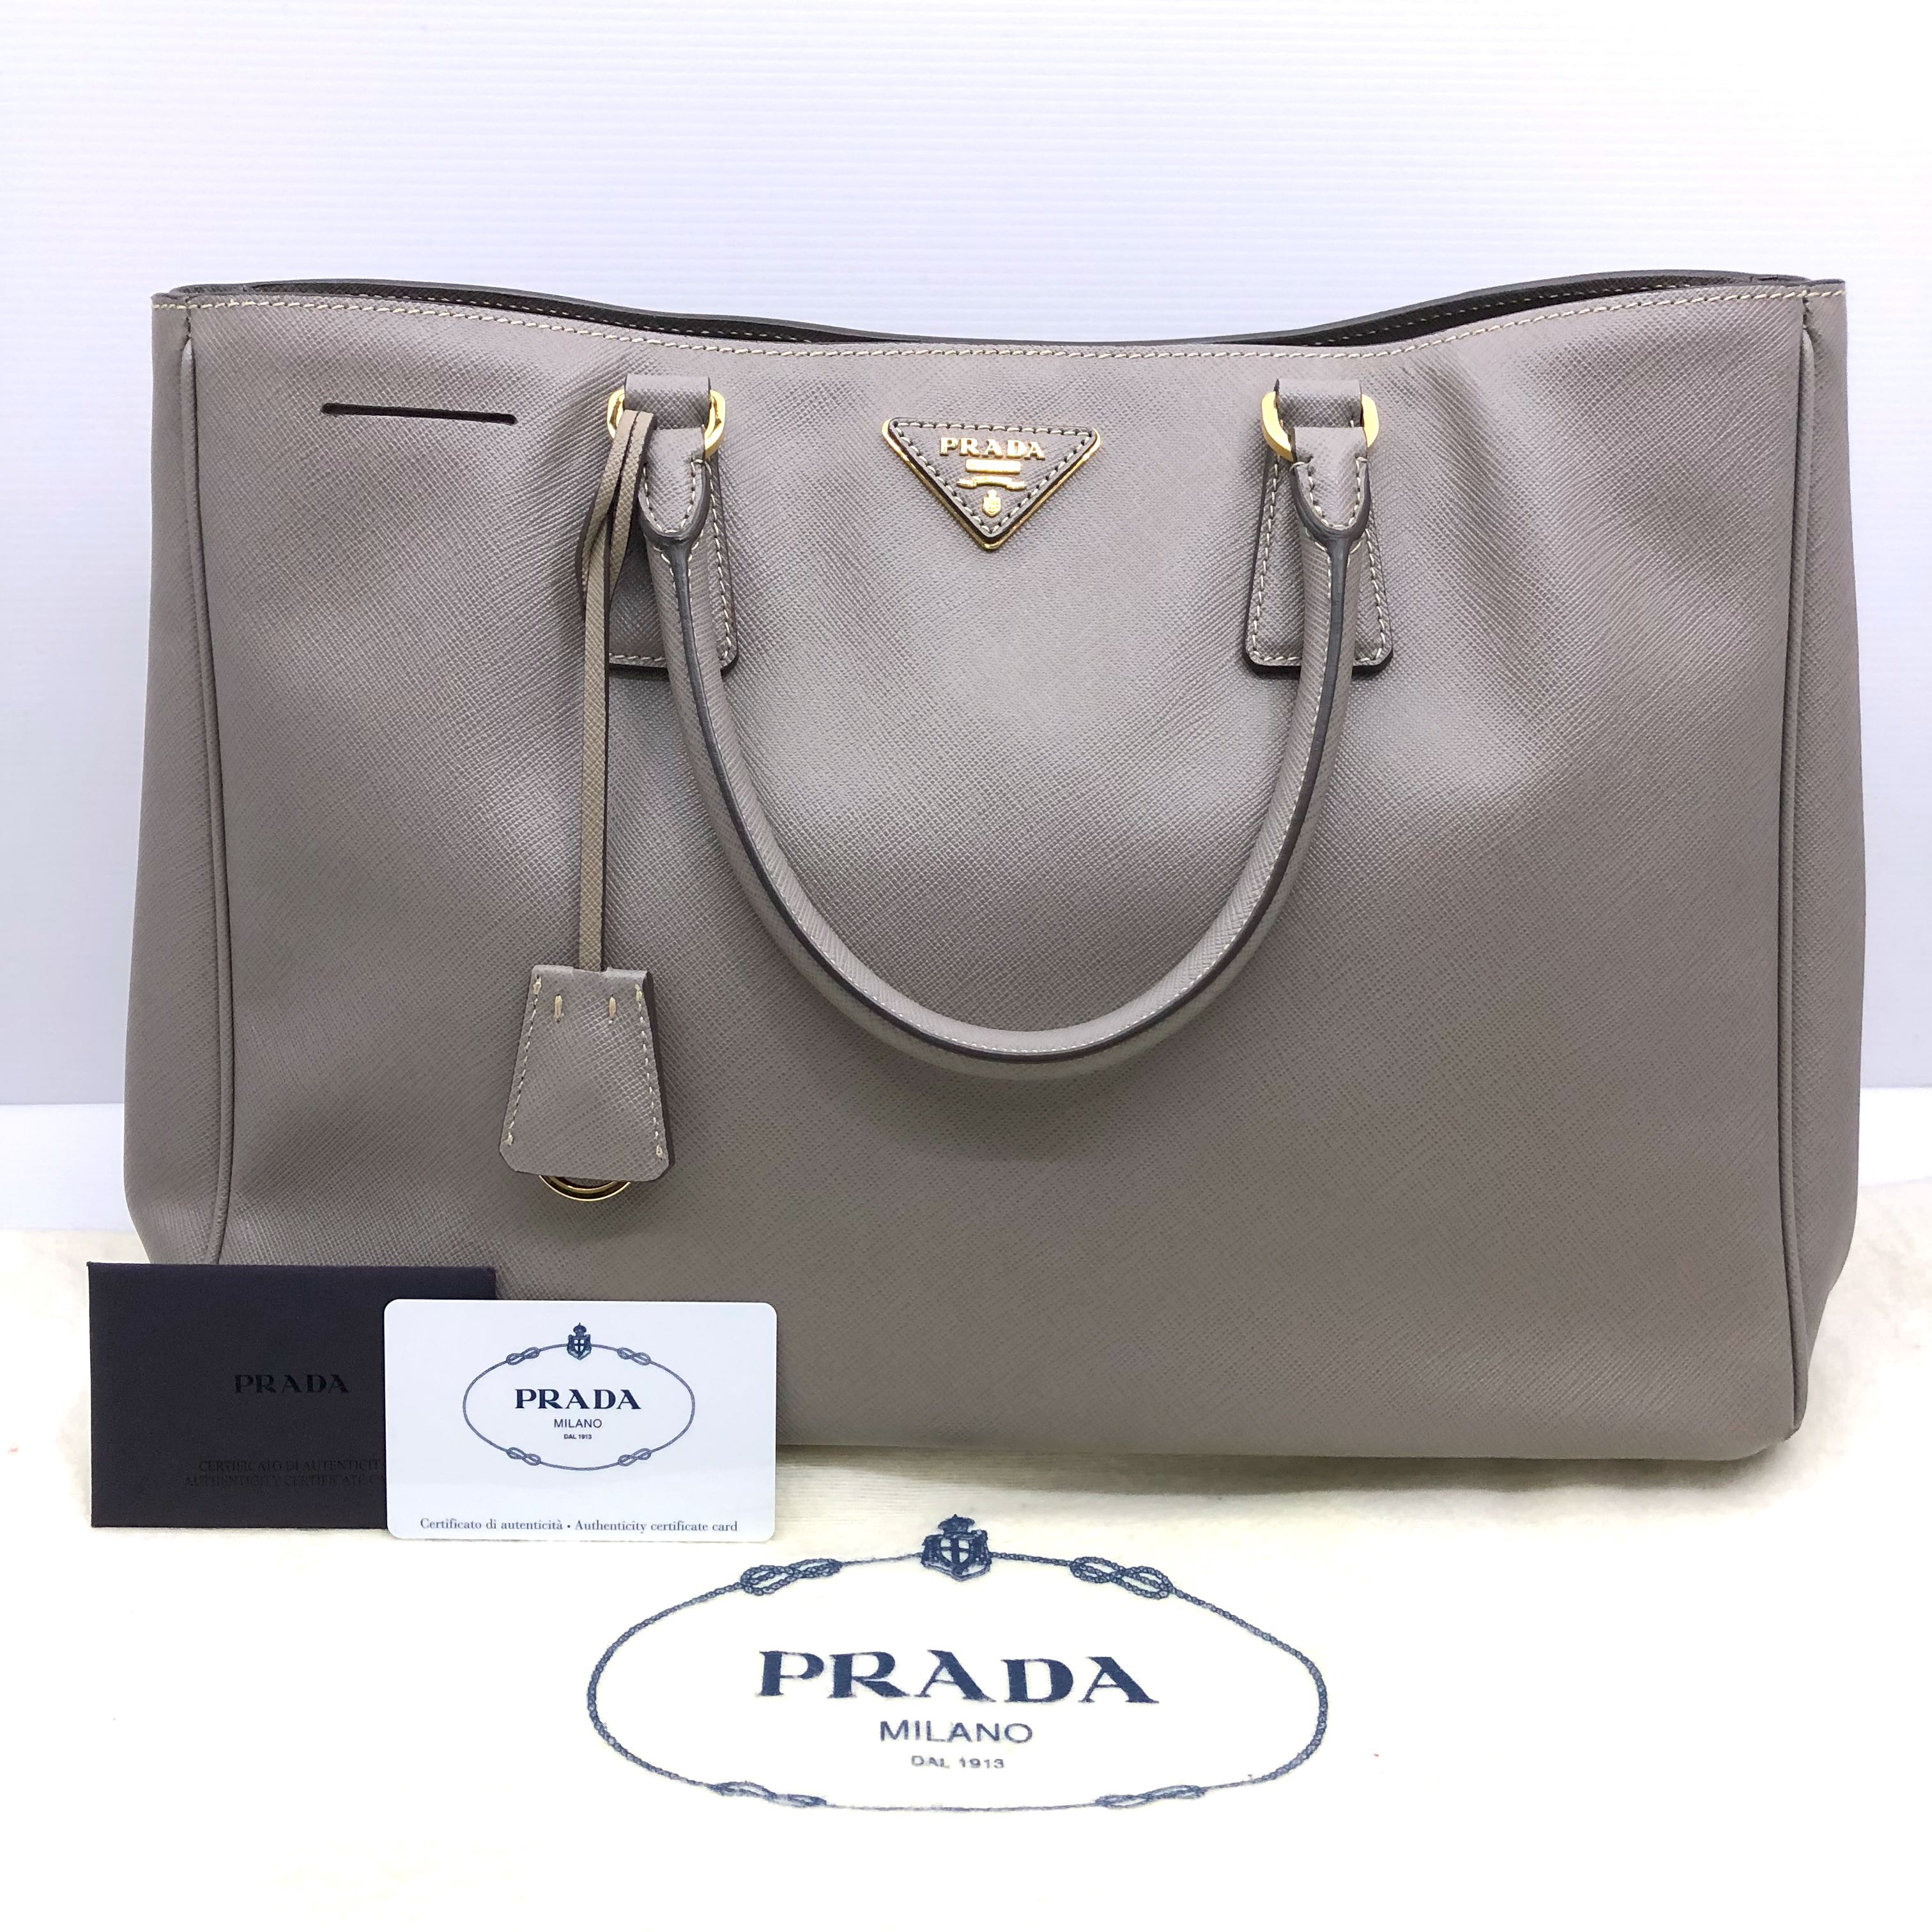 c267161737 ... reduced prada saffiano lux bag 187003535 womens fashion bags wallets  handbags on carousell e68f0 d3da6